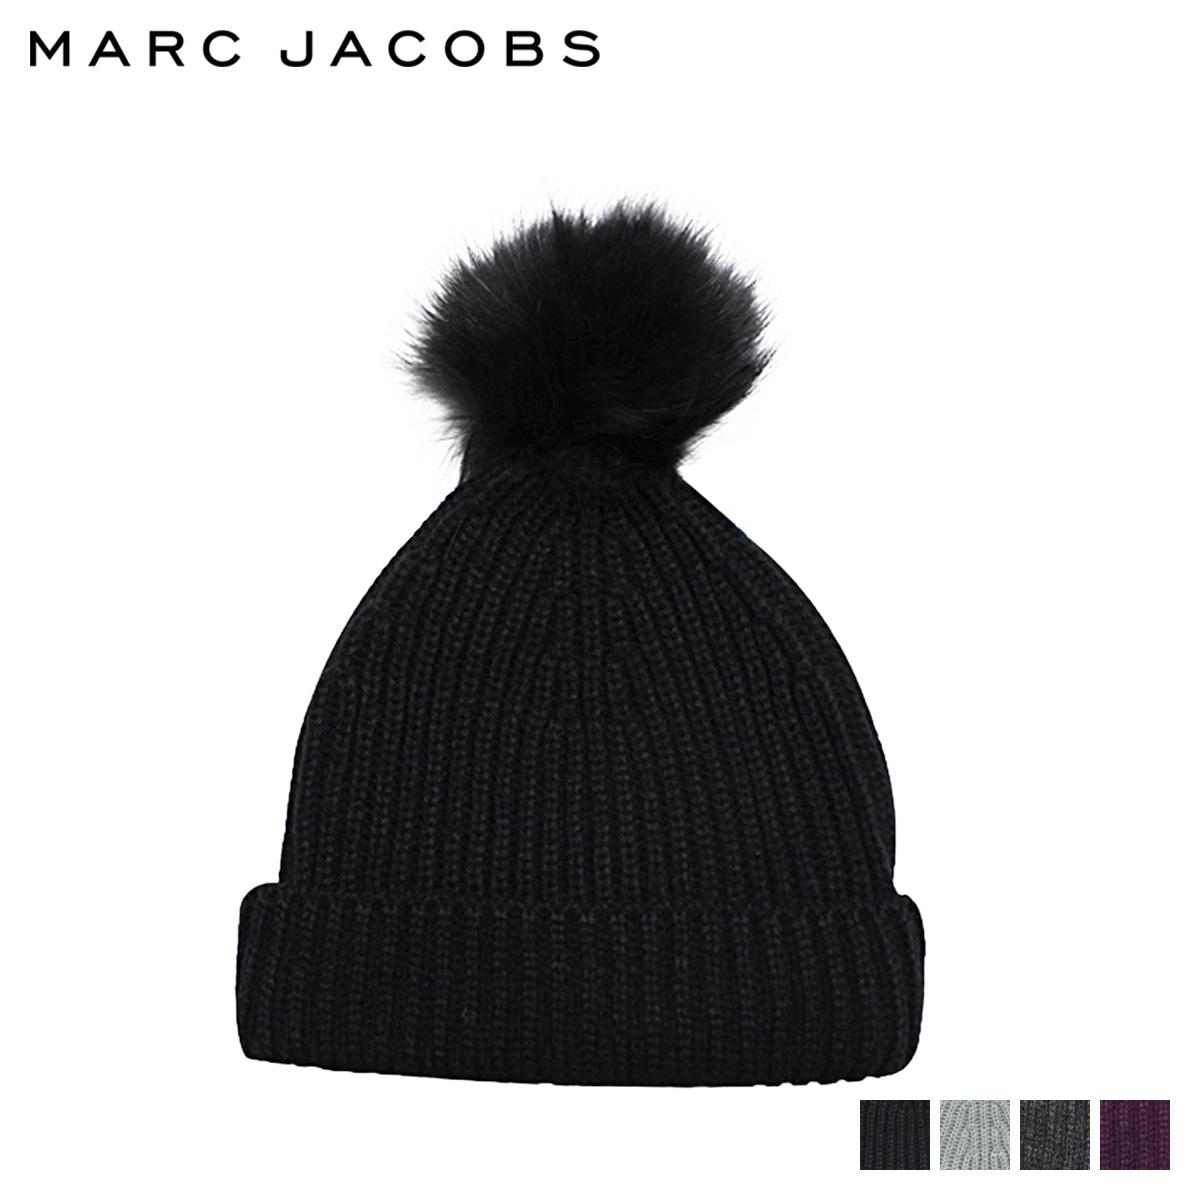 Mark by Mark Jacobs MARC BY MARC JACOBS knit hat Beanie men s women s knit Cap  Hat 2014 5c65bb912f6